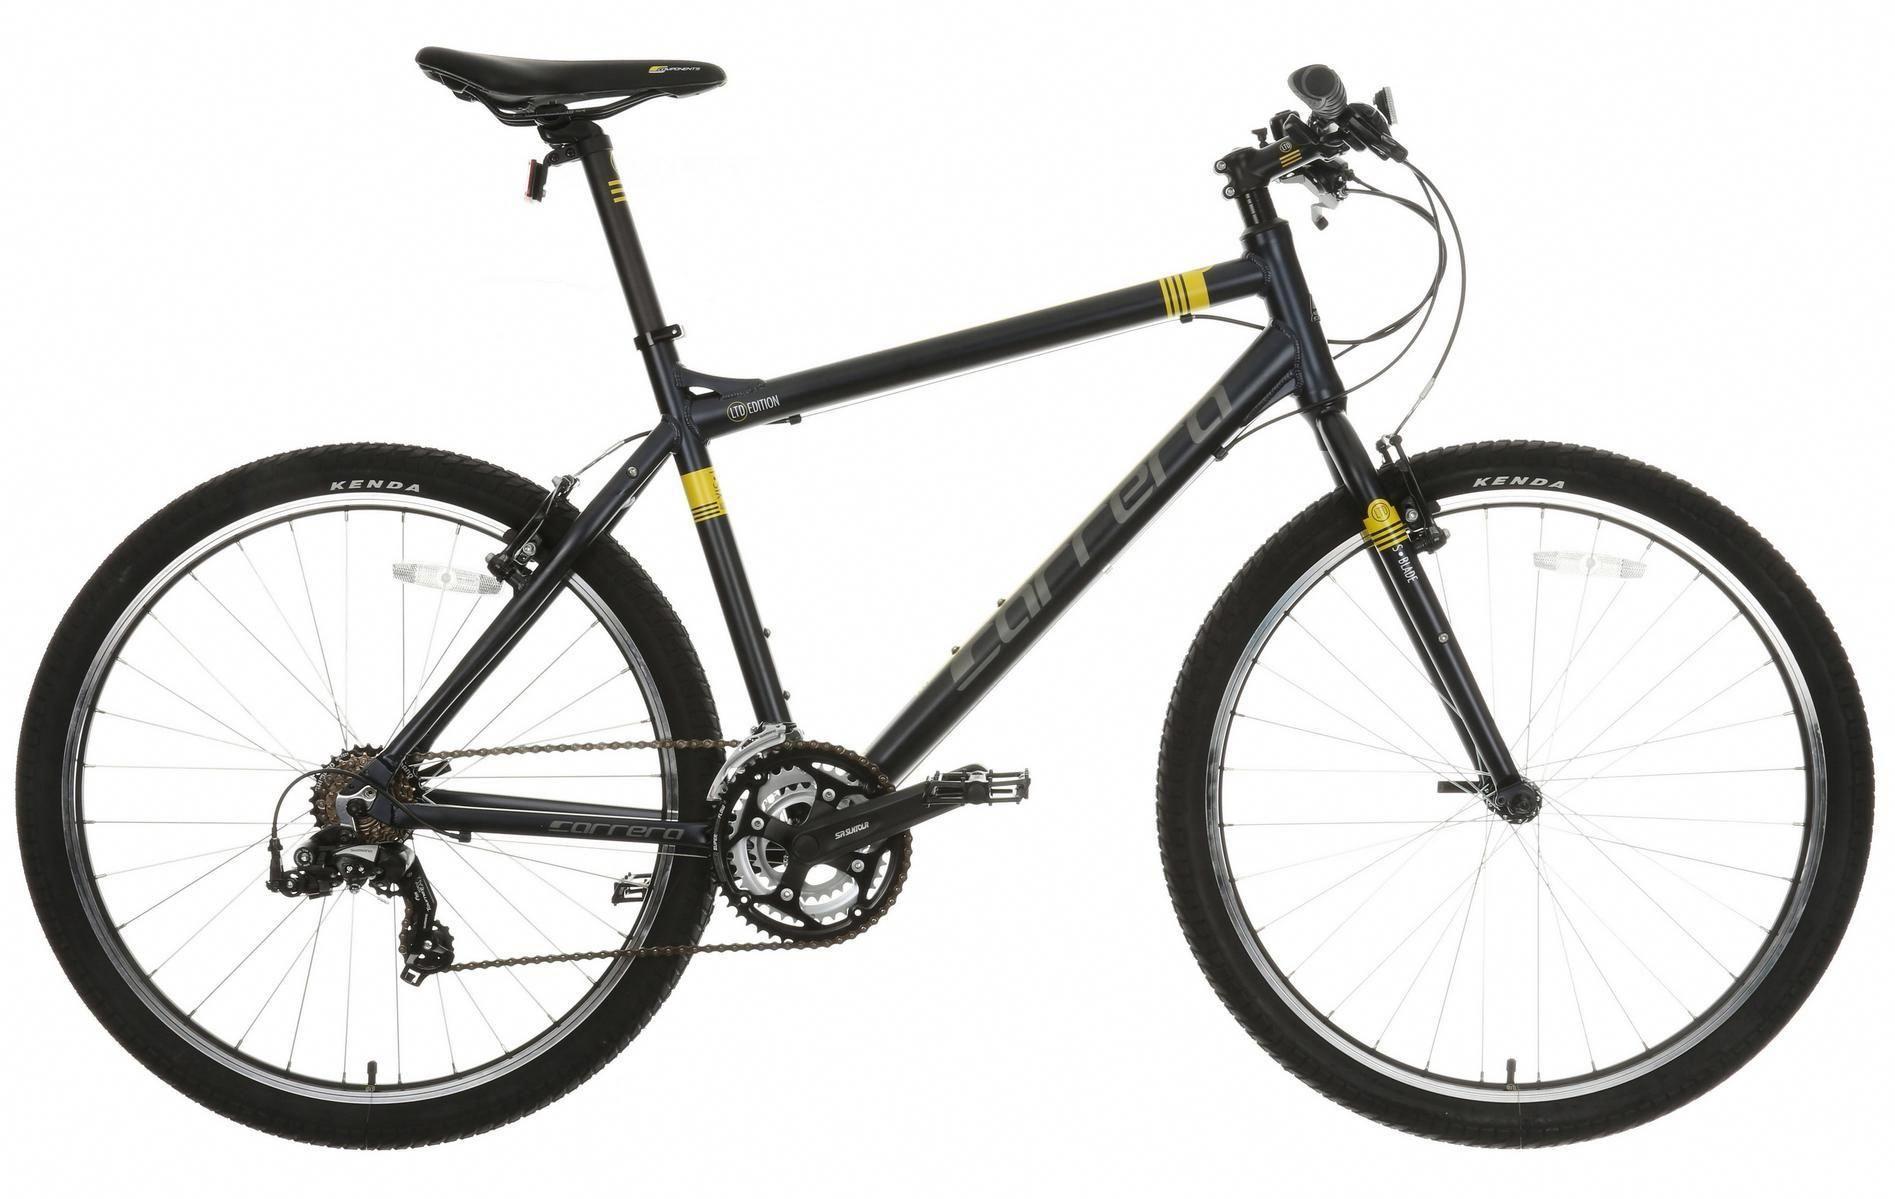 Carrera Parva Mens Hybrid Bike Hybridbike Bike Classic Bikes Bicycle